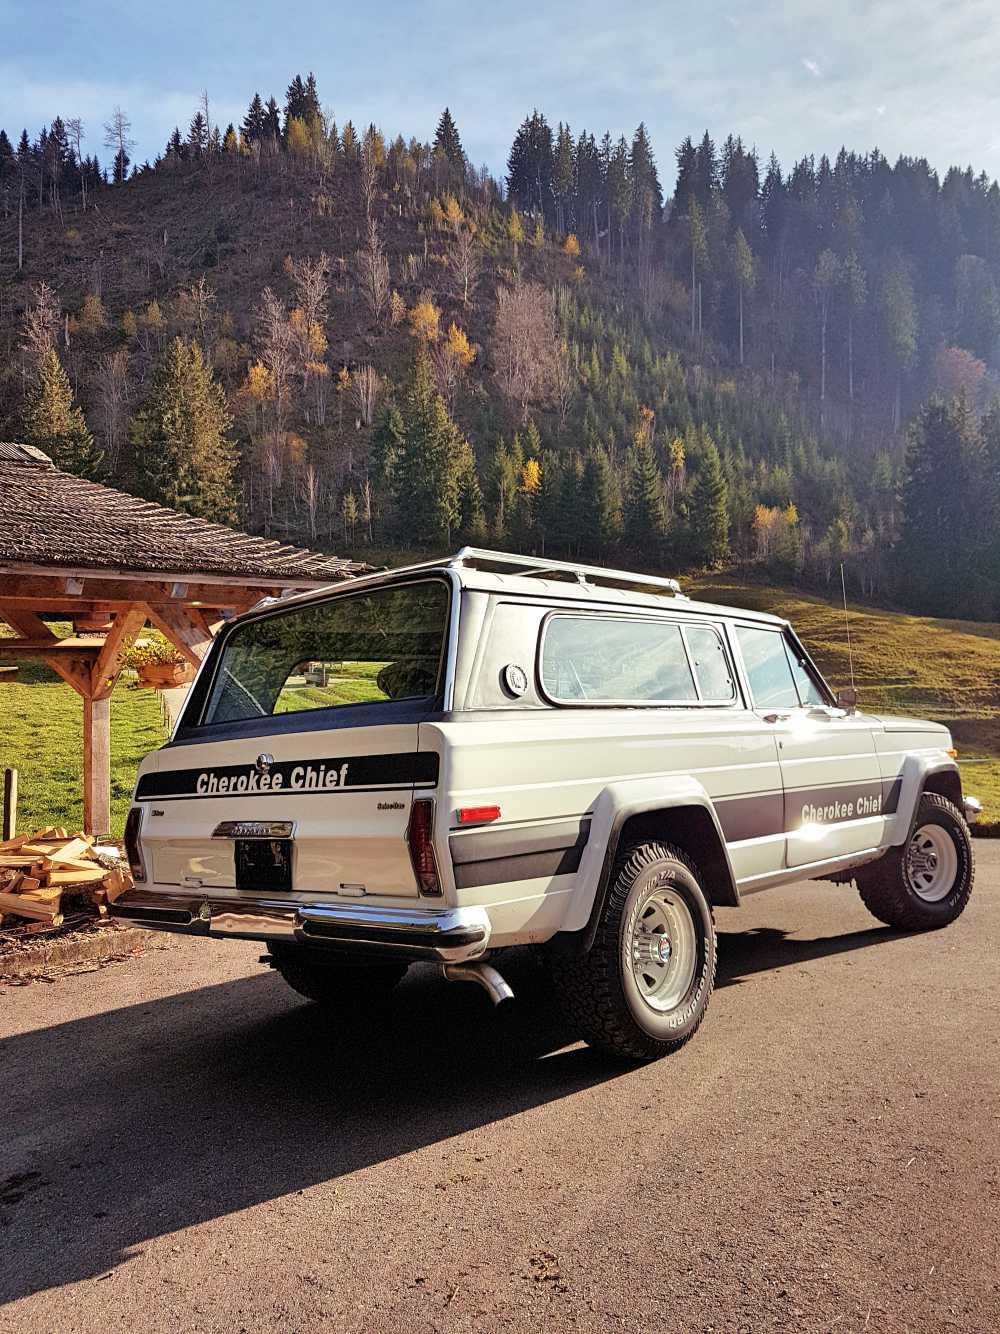 jeep-cherokee-chief-1978-shooting-moleson-64